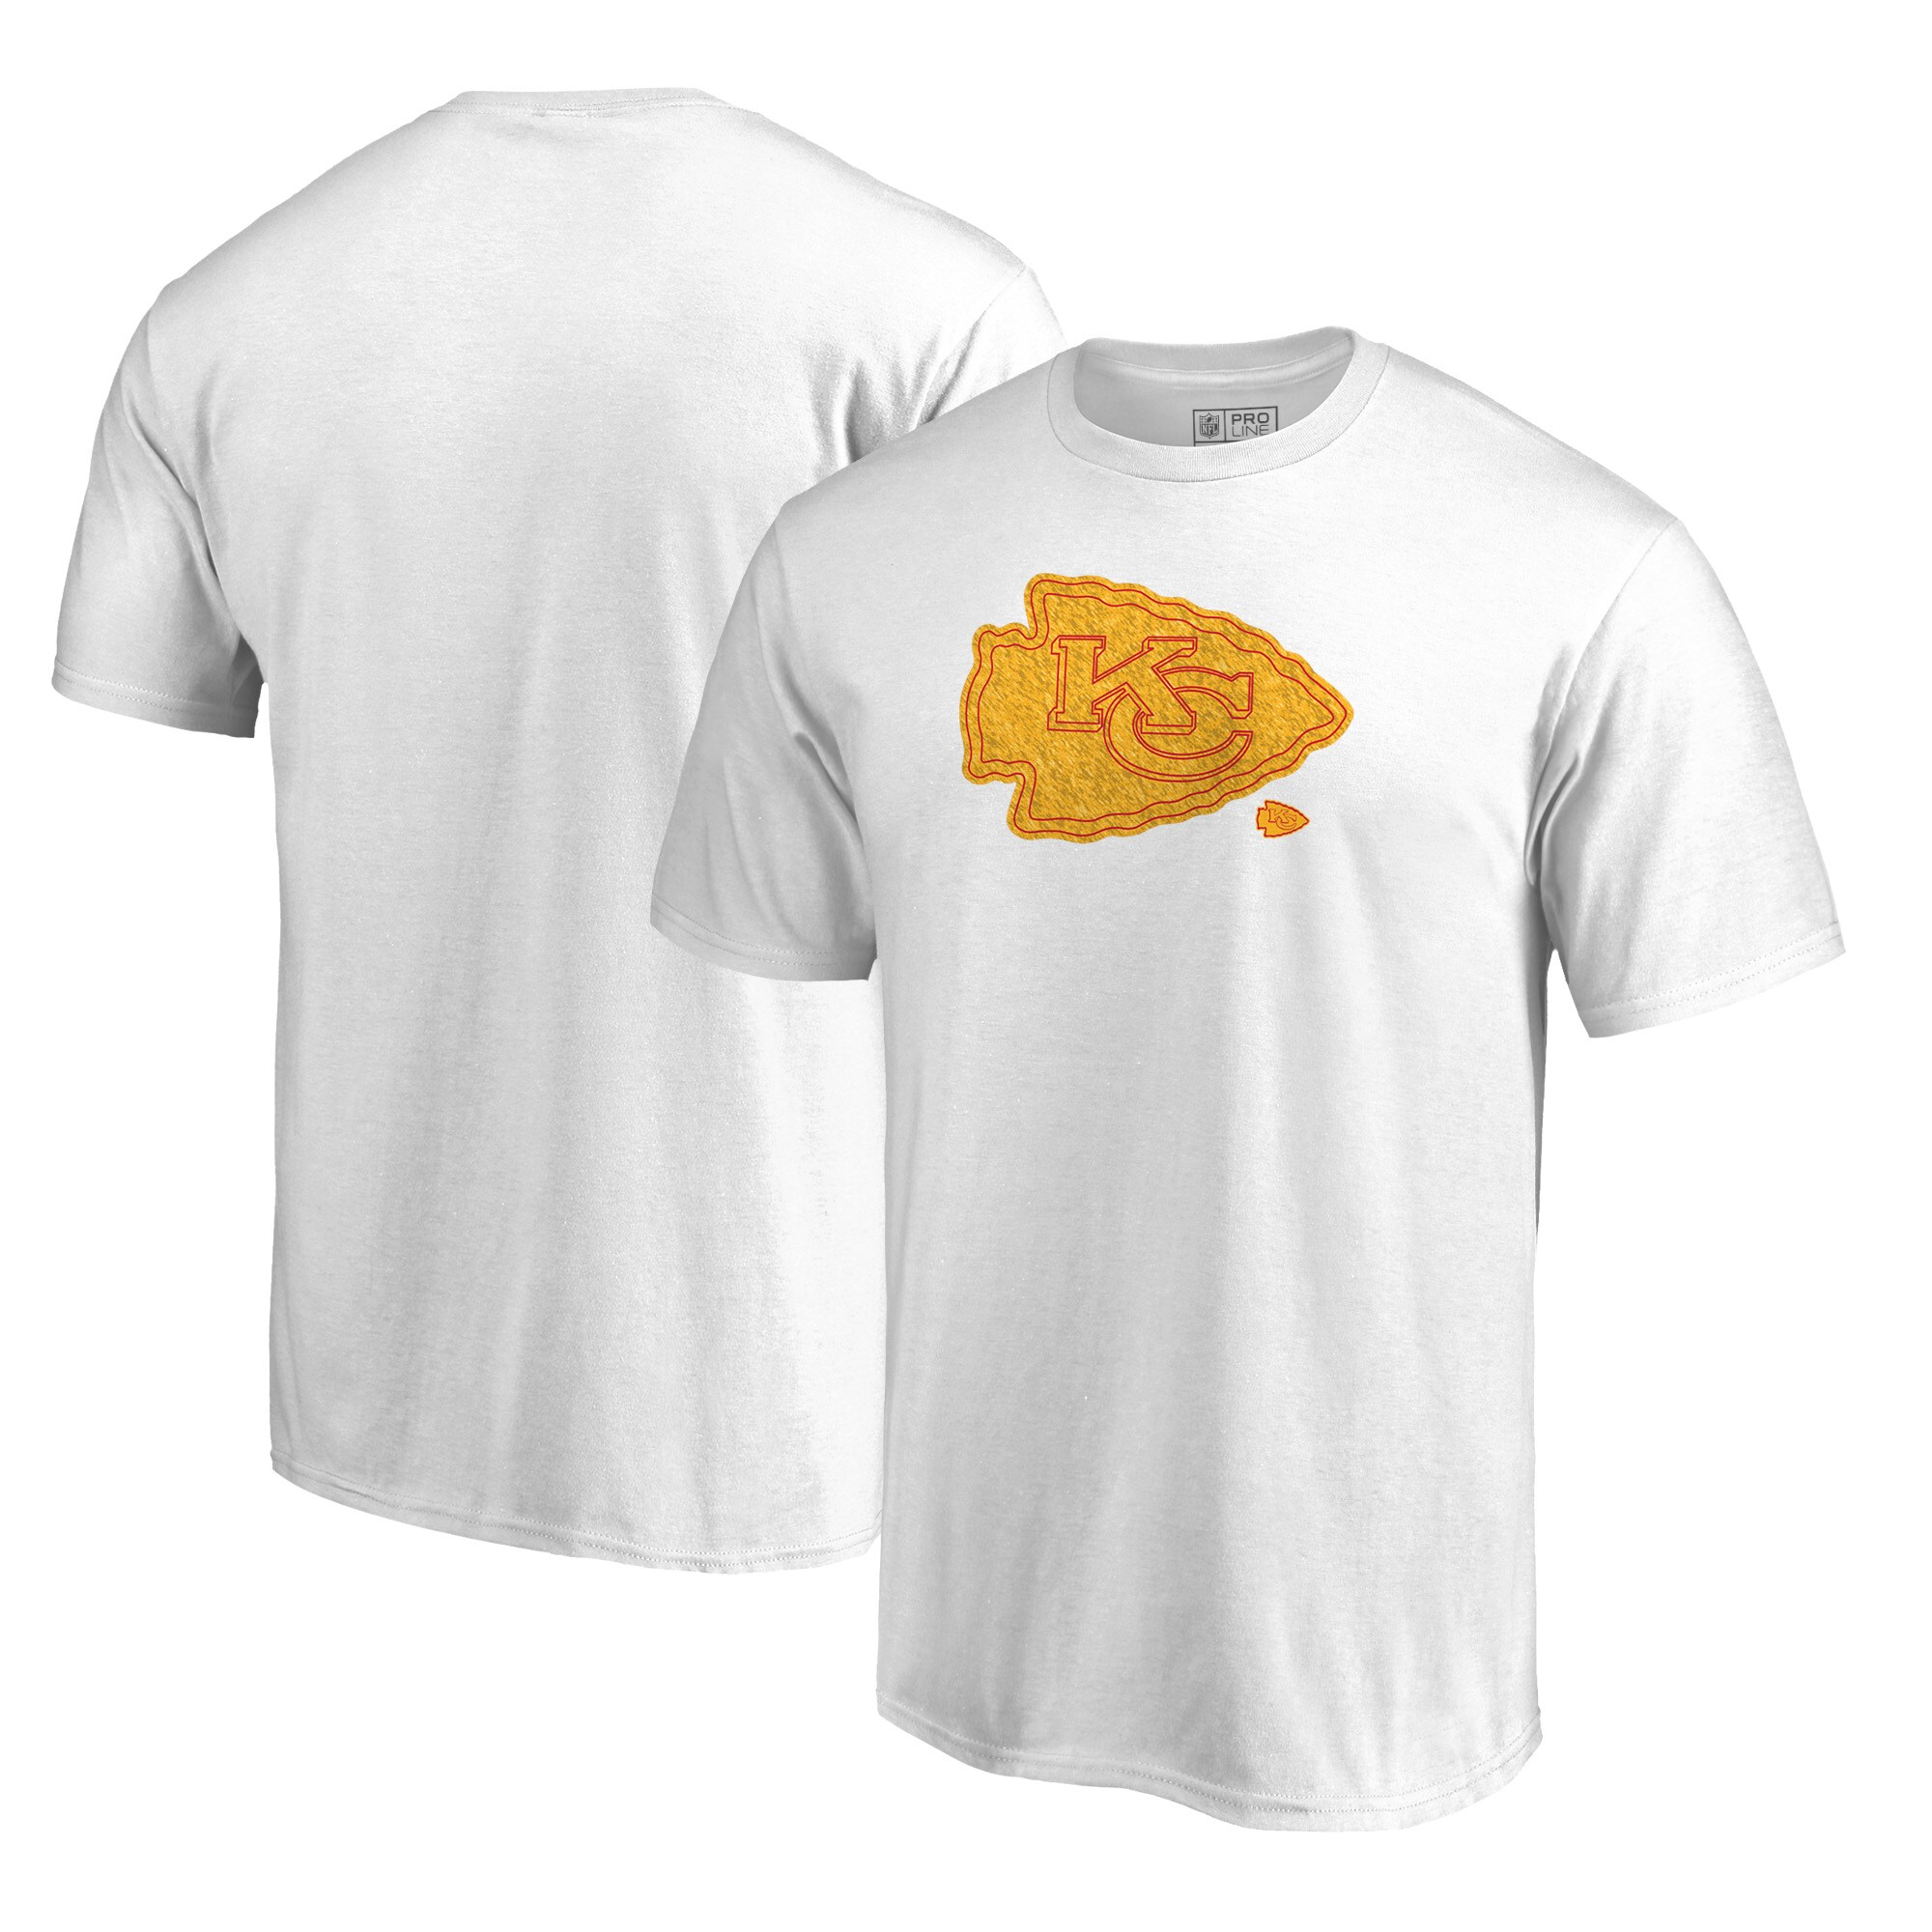 Kansas City Chiefs NFL Pro Line by Fanatics Branded Big & Tall Training Camp Hookup T-Shirt - White